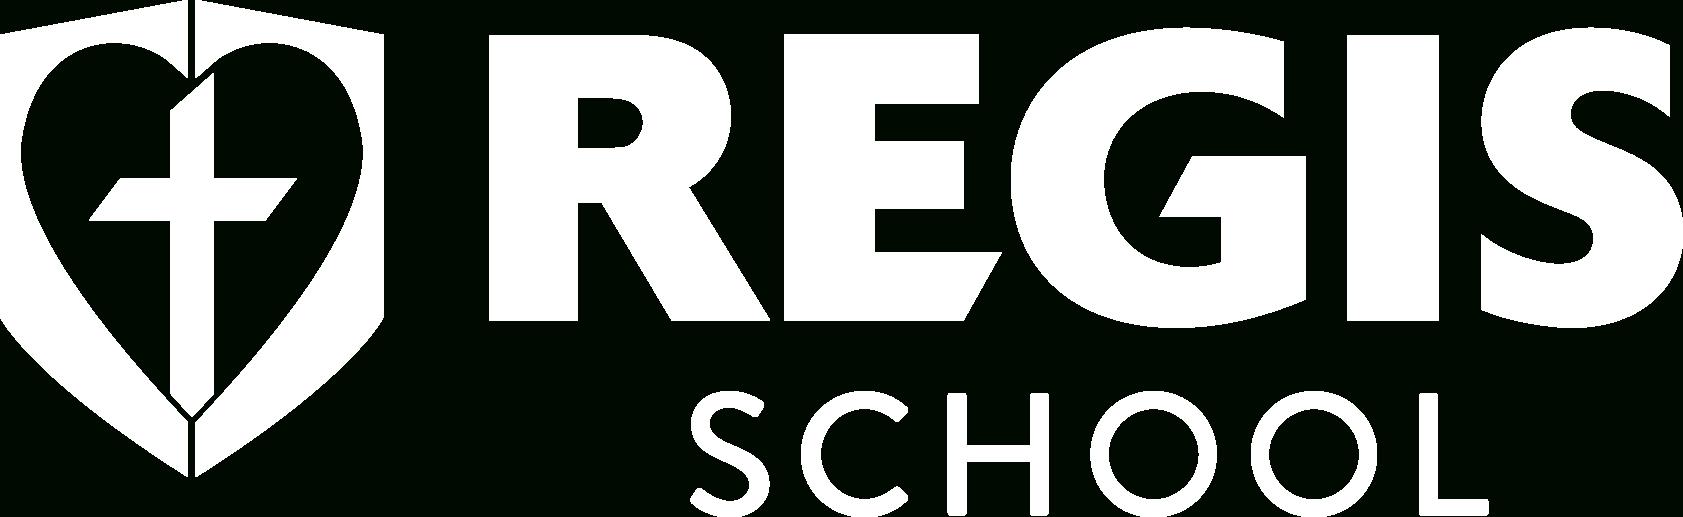 Calendars - The Regis School Of The Sacred Heart